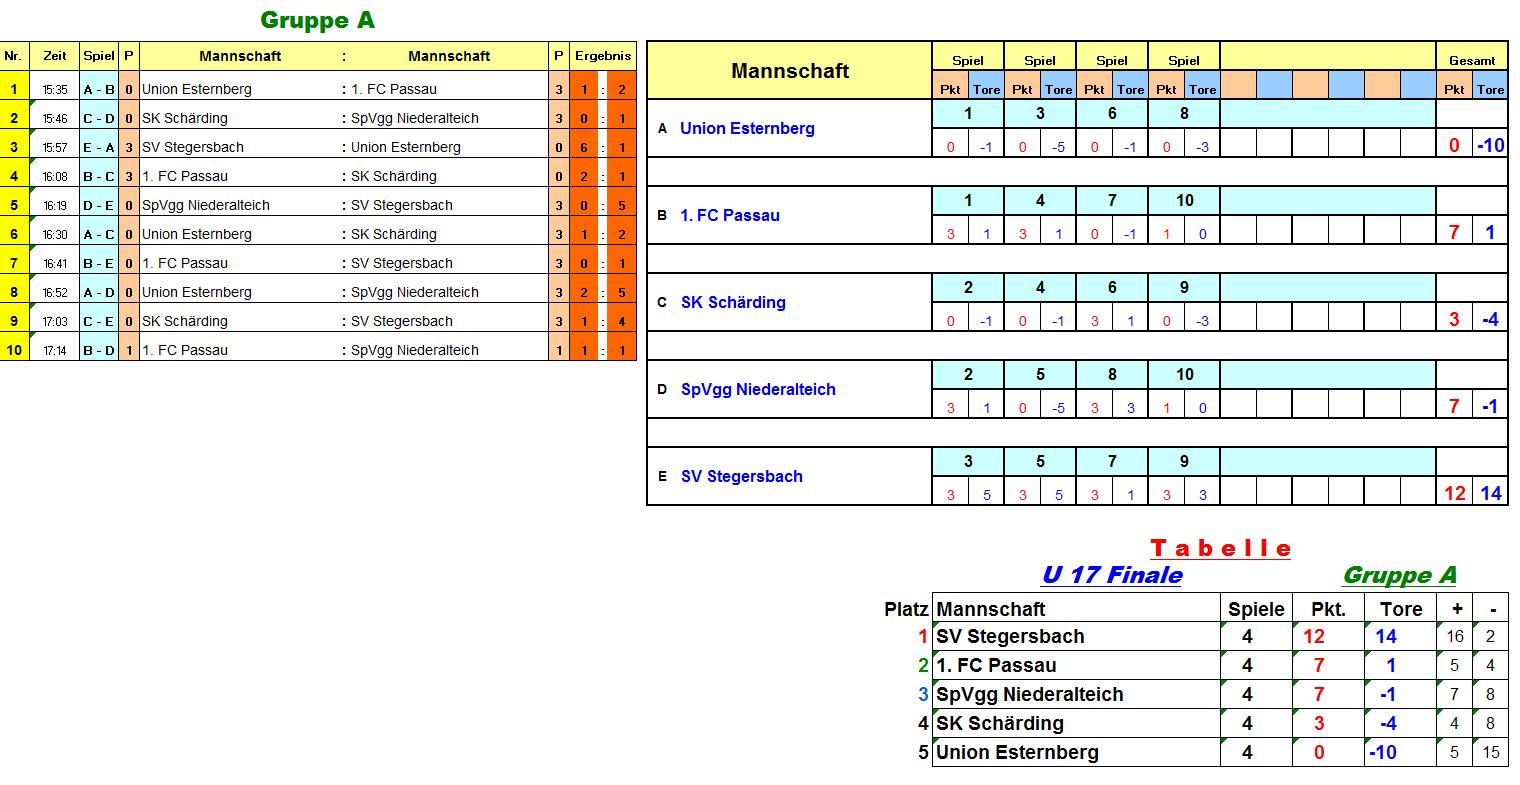 u17finale_gruppe_a